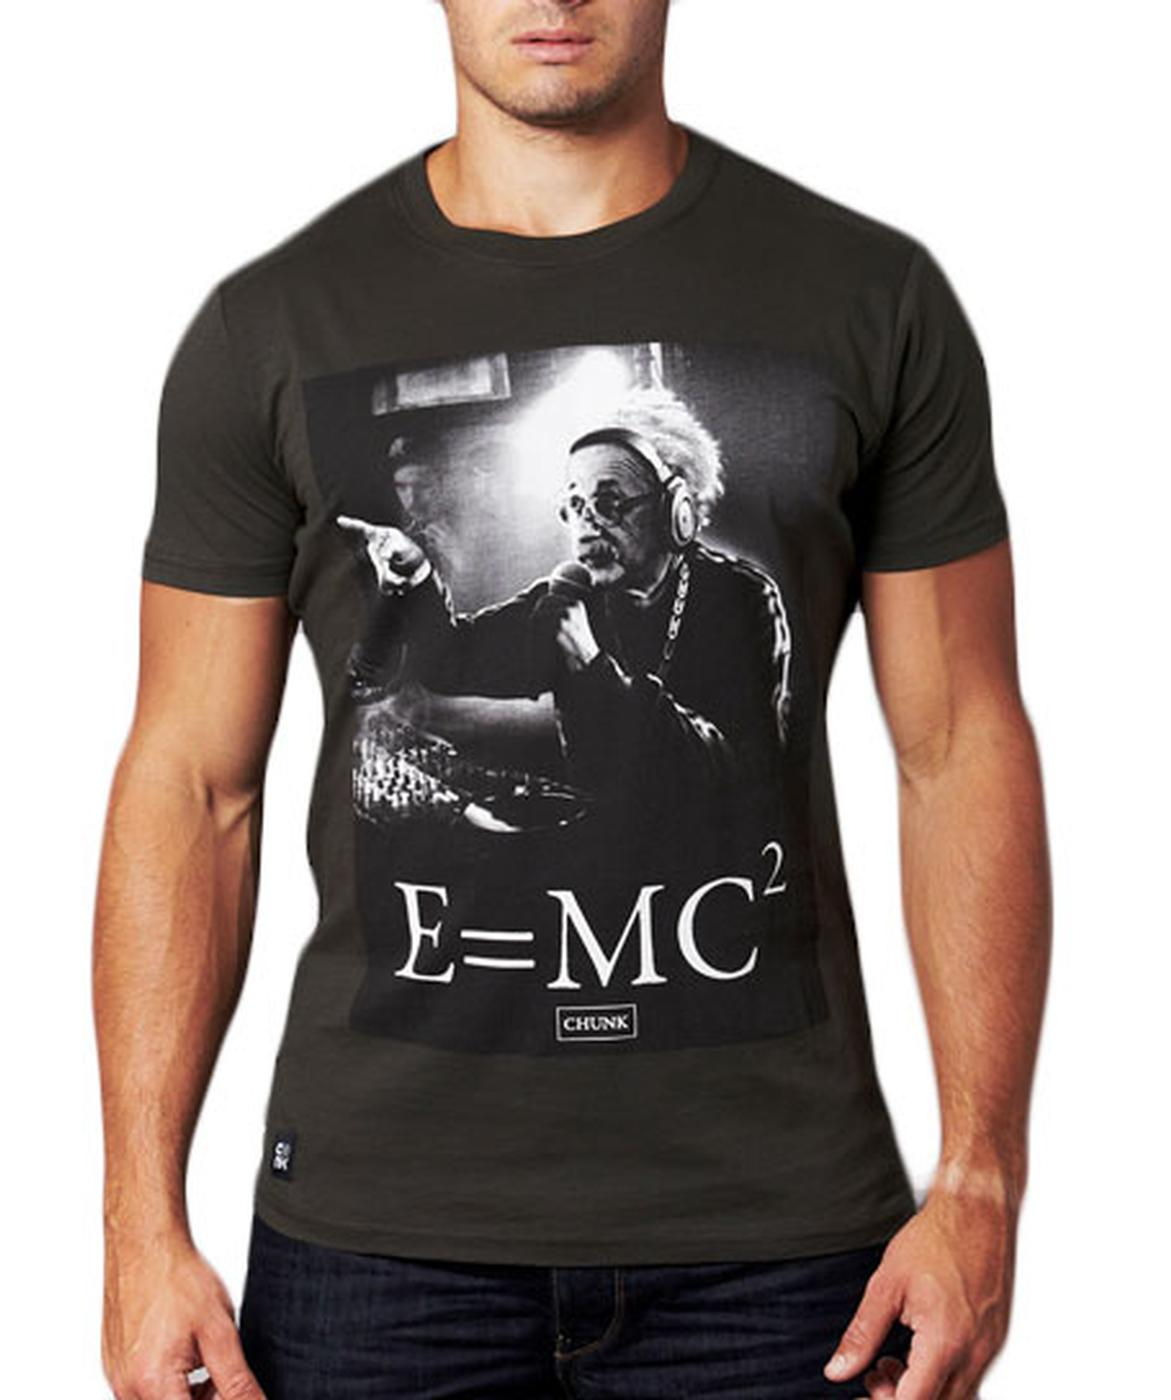 E=MC CHUNK Albert Einstein Retro Print T-shirt